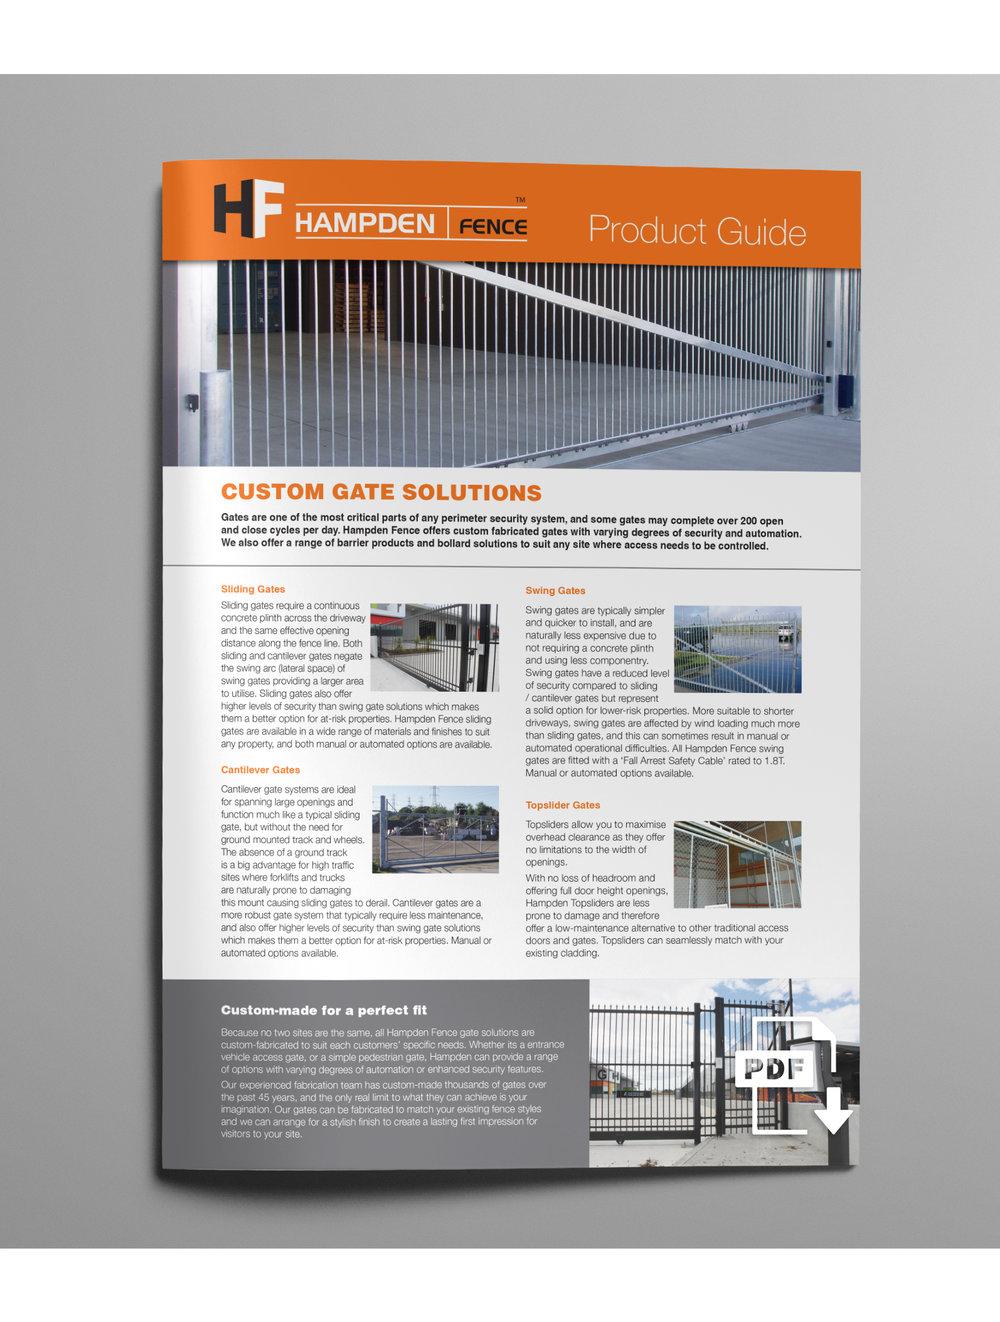 CUSTOM GATE SOLUTIONS